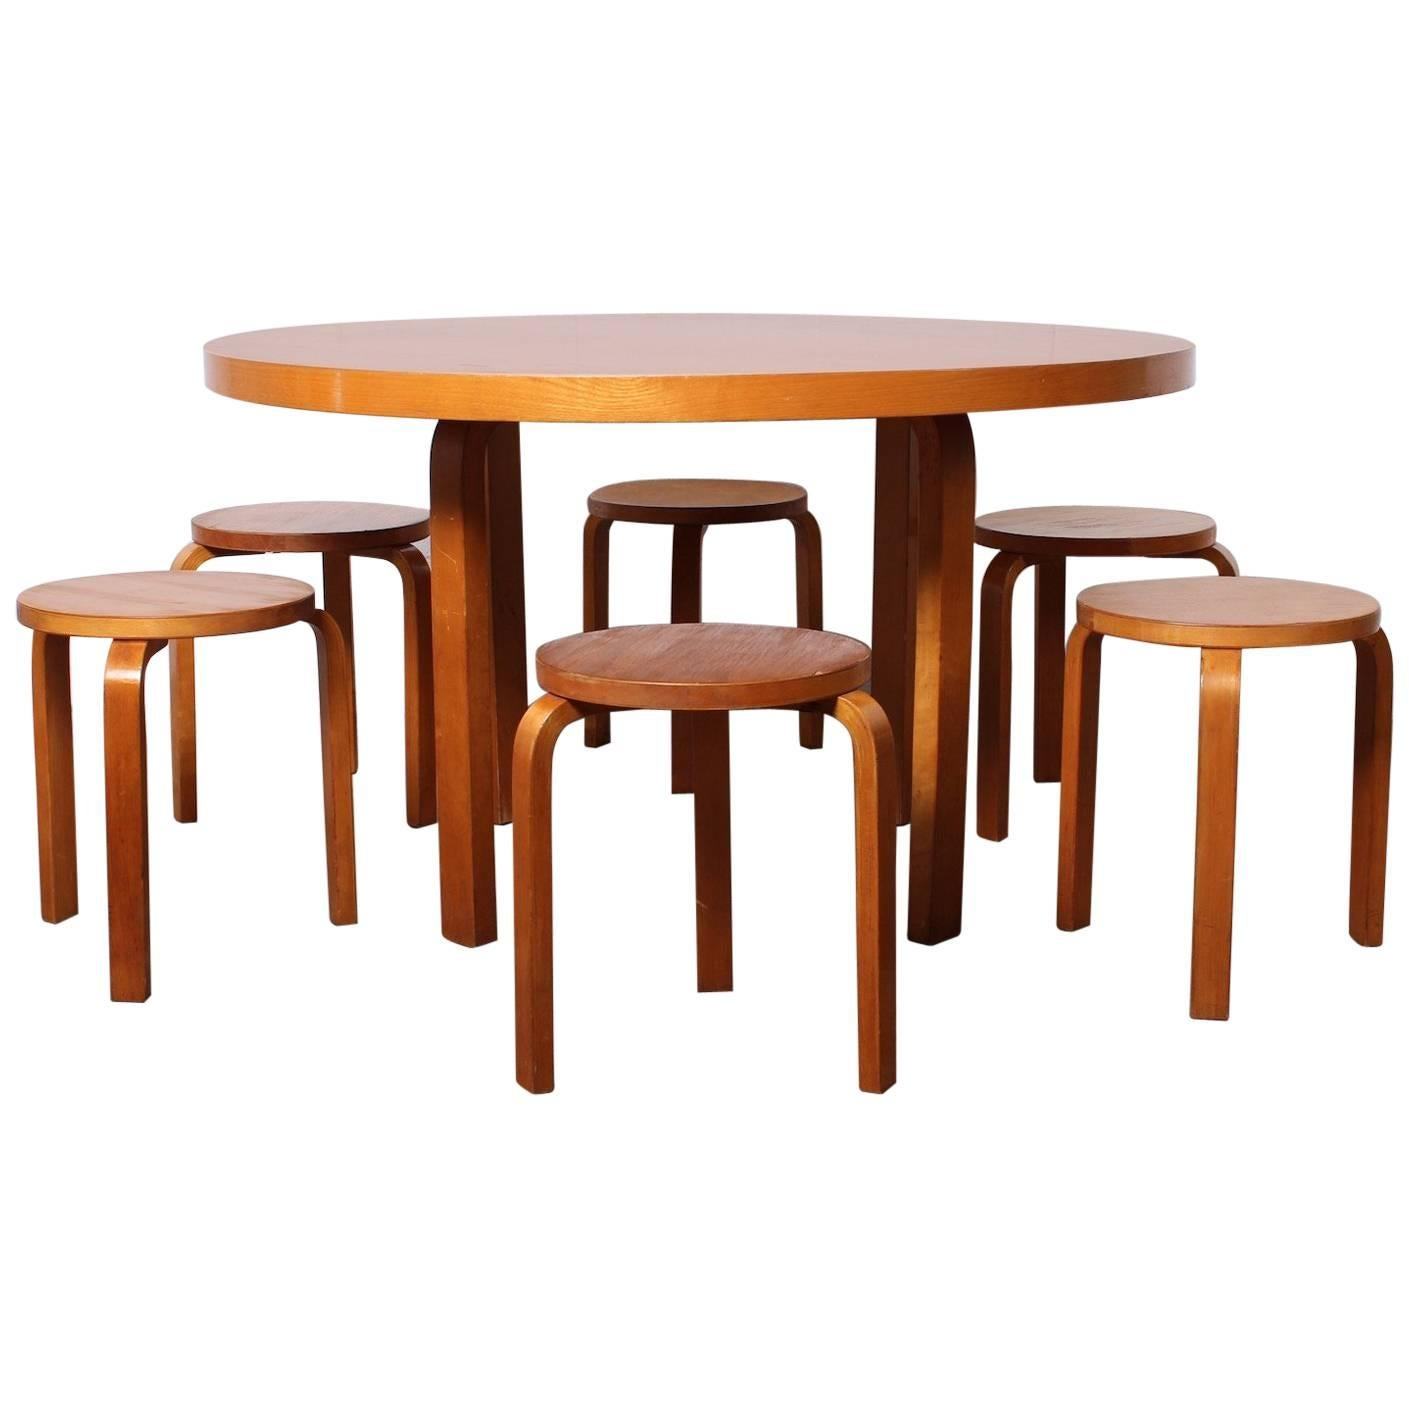 Alvar Aalto Table And Stools 1